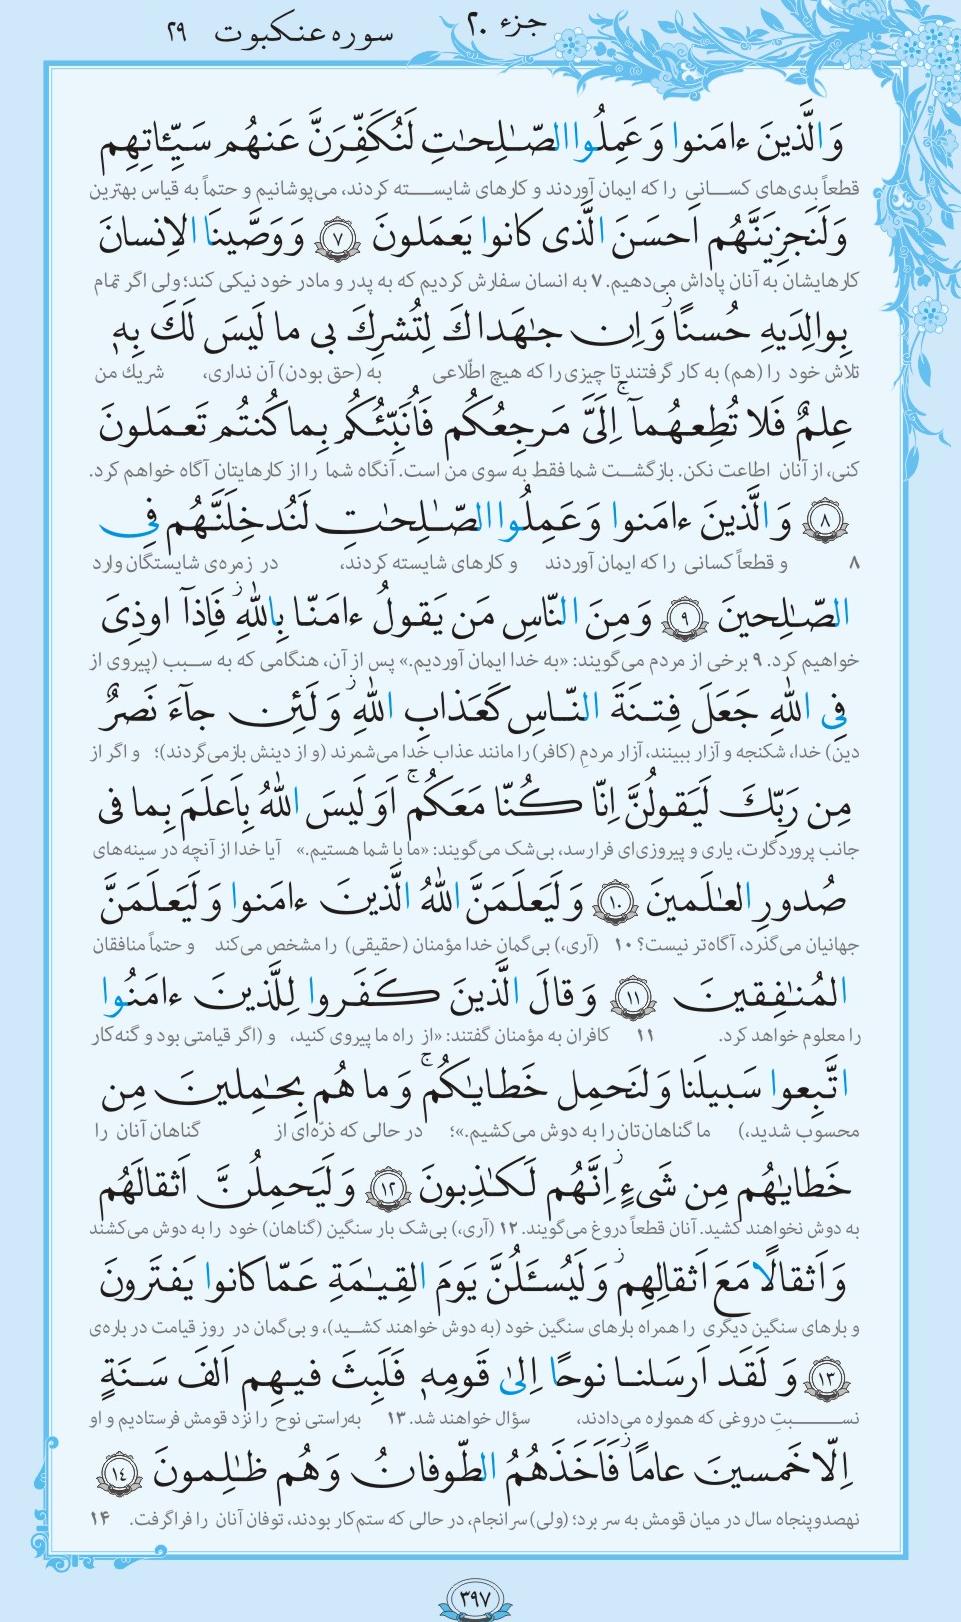 13990331000803 Test NewPhotoFree - ترتیل صفحه ۳۹۷ قرآن باصدای مصطفی اسماعیل+صوت و متن